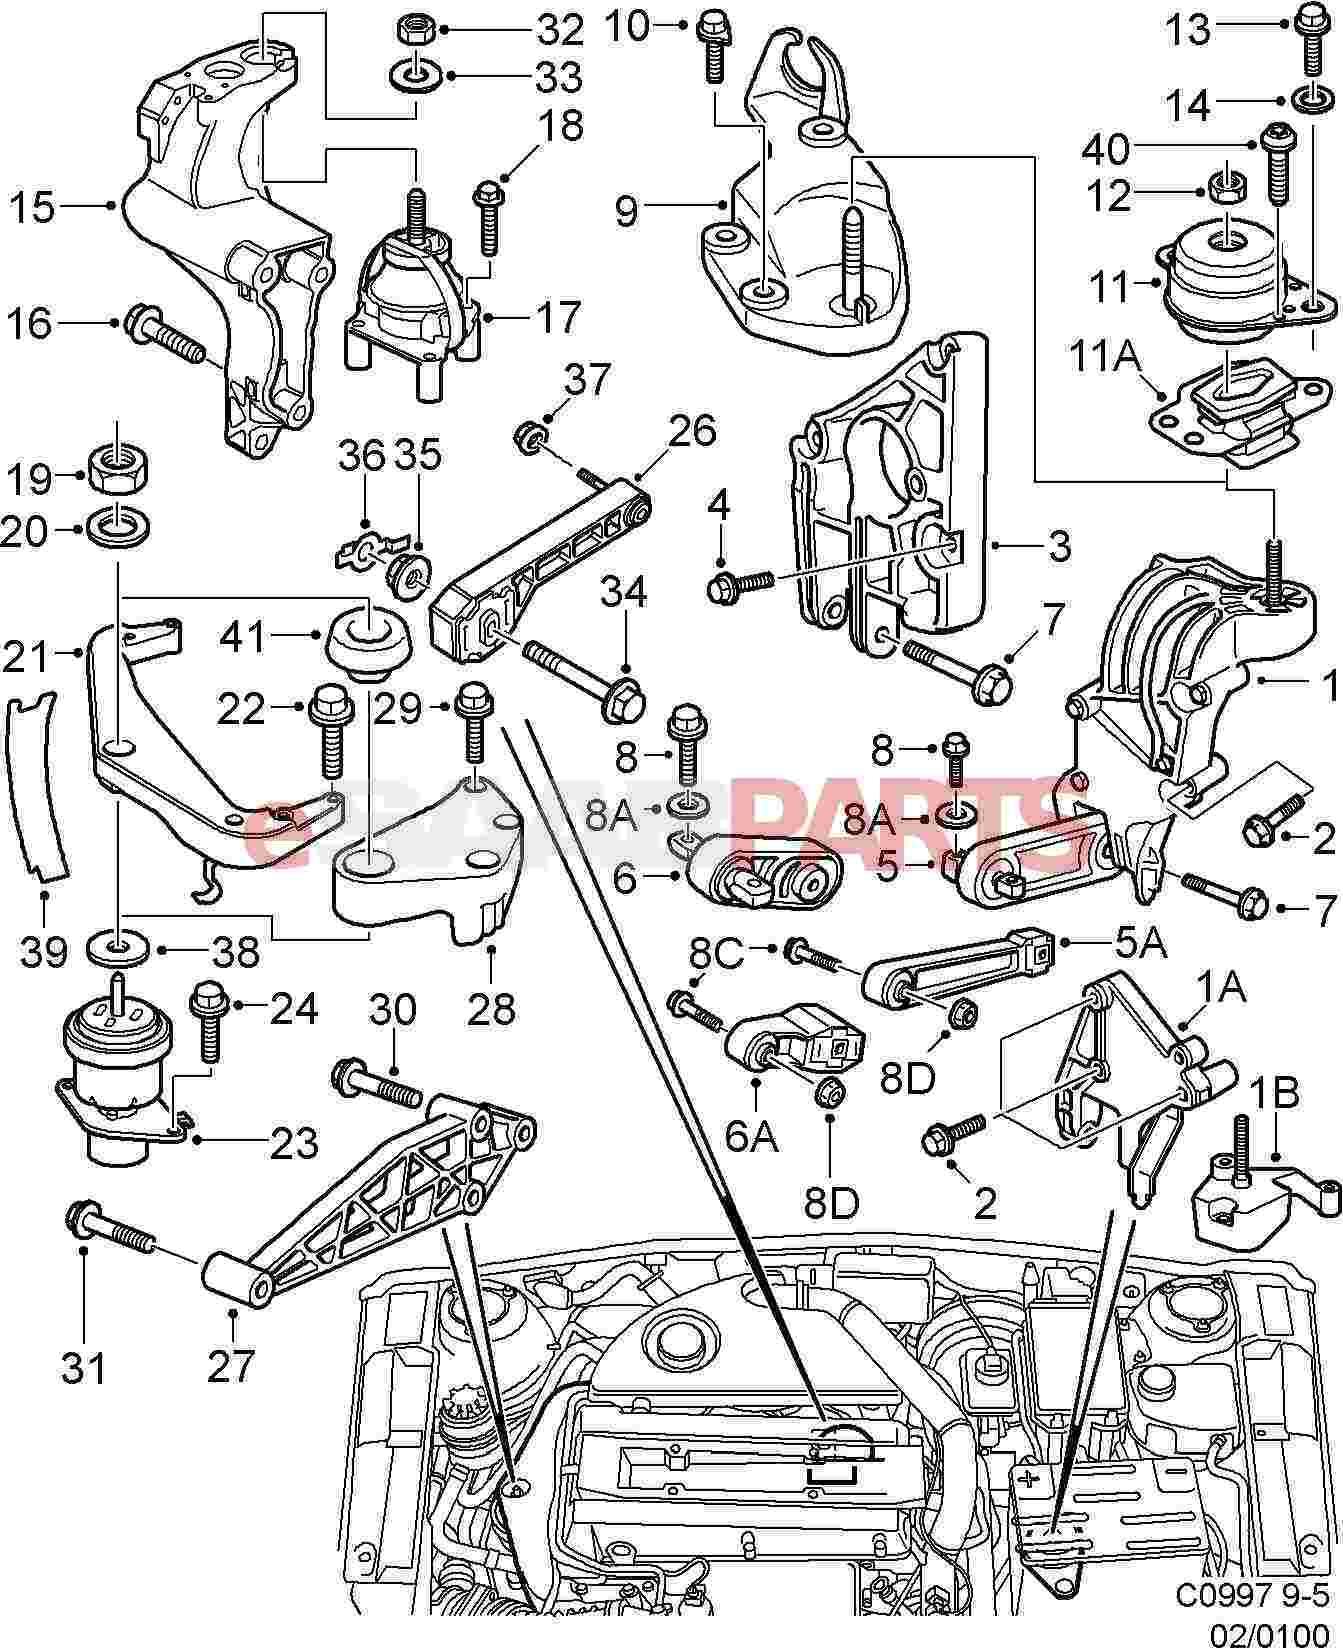 saab 9 5 engine wiring diagram 2006 saab 9